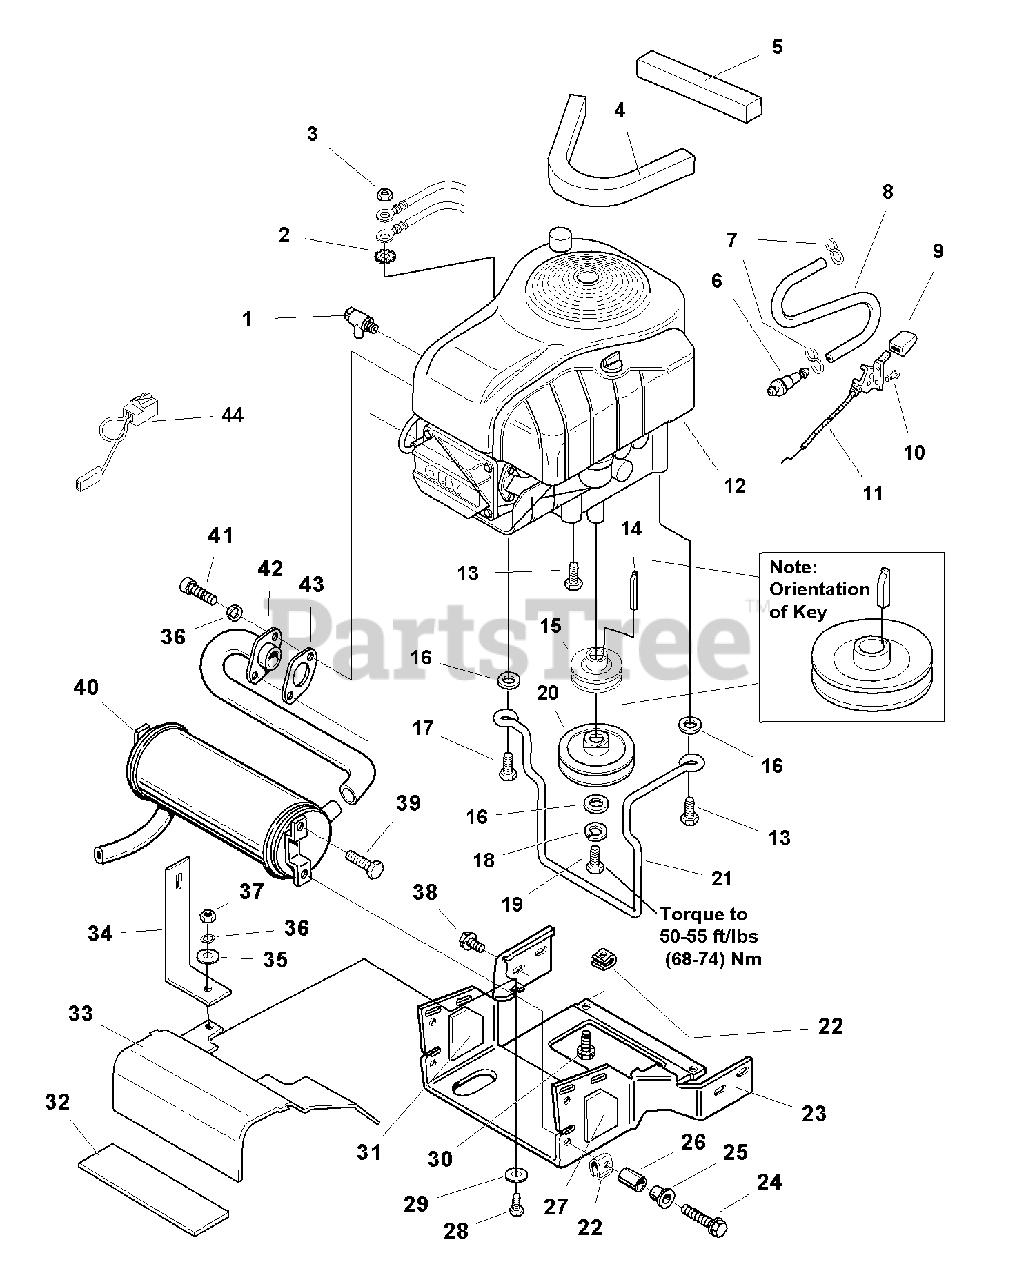 Chrysler 35 Engine Diagram